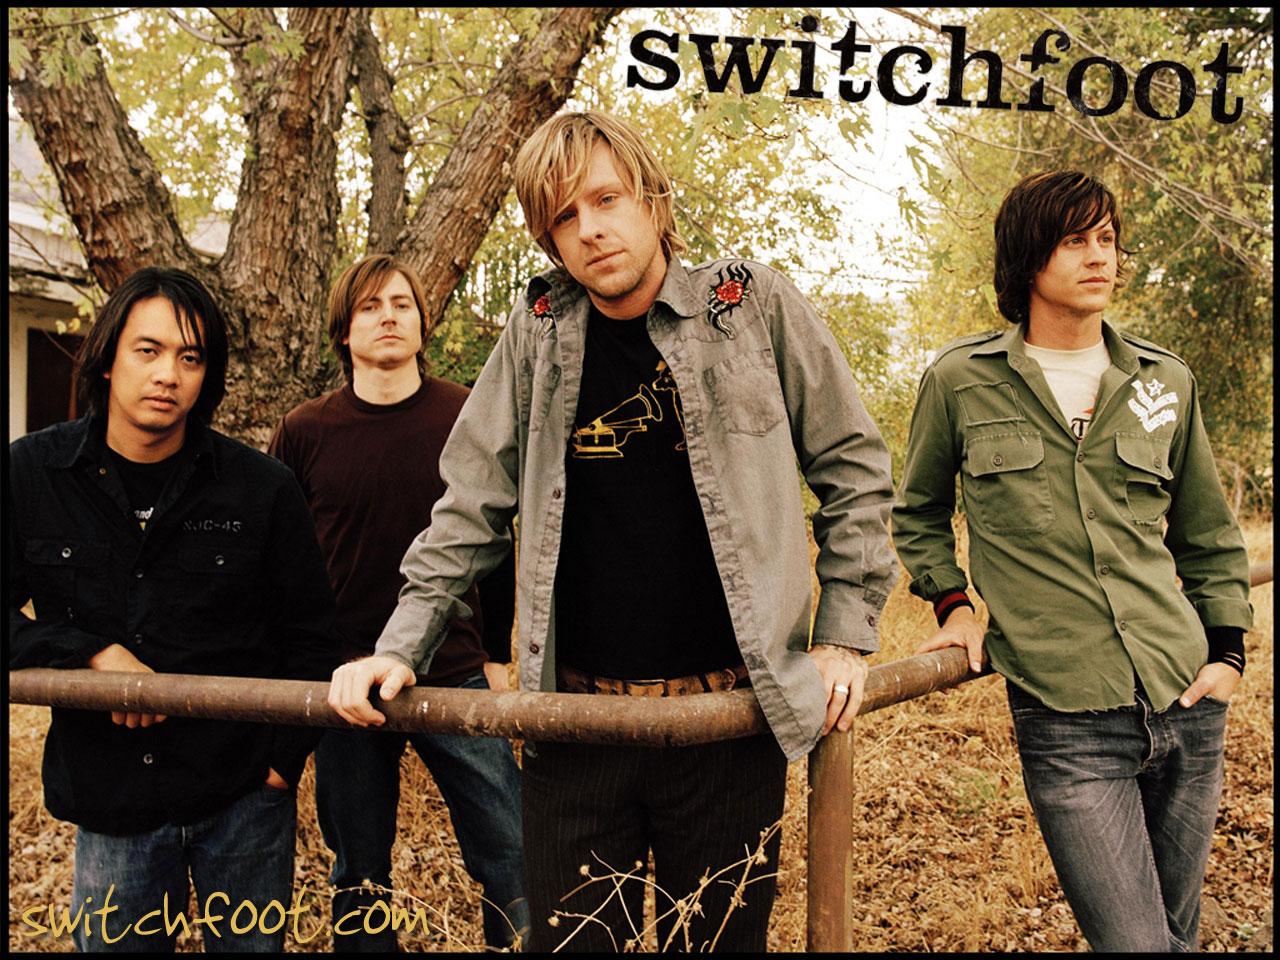 Switchfoot christian music papel de parede imagem